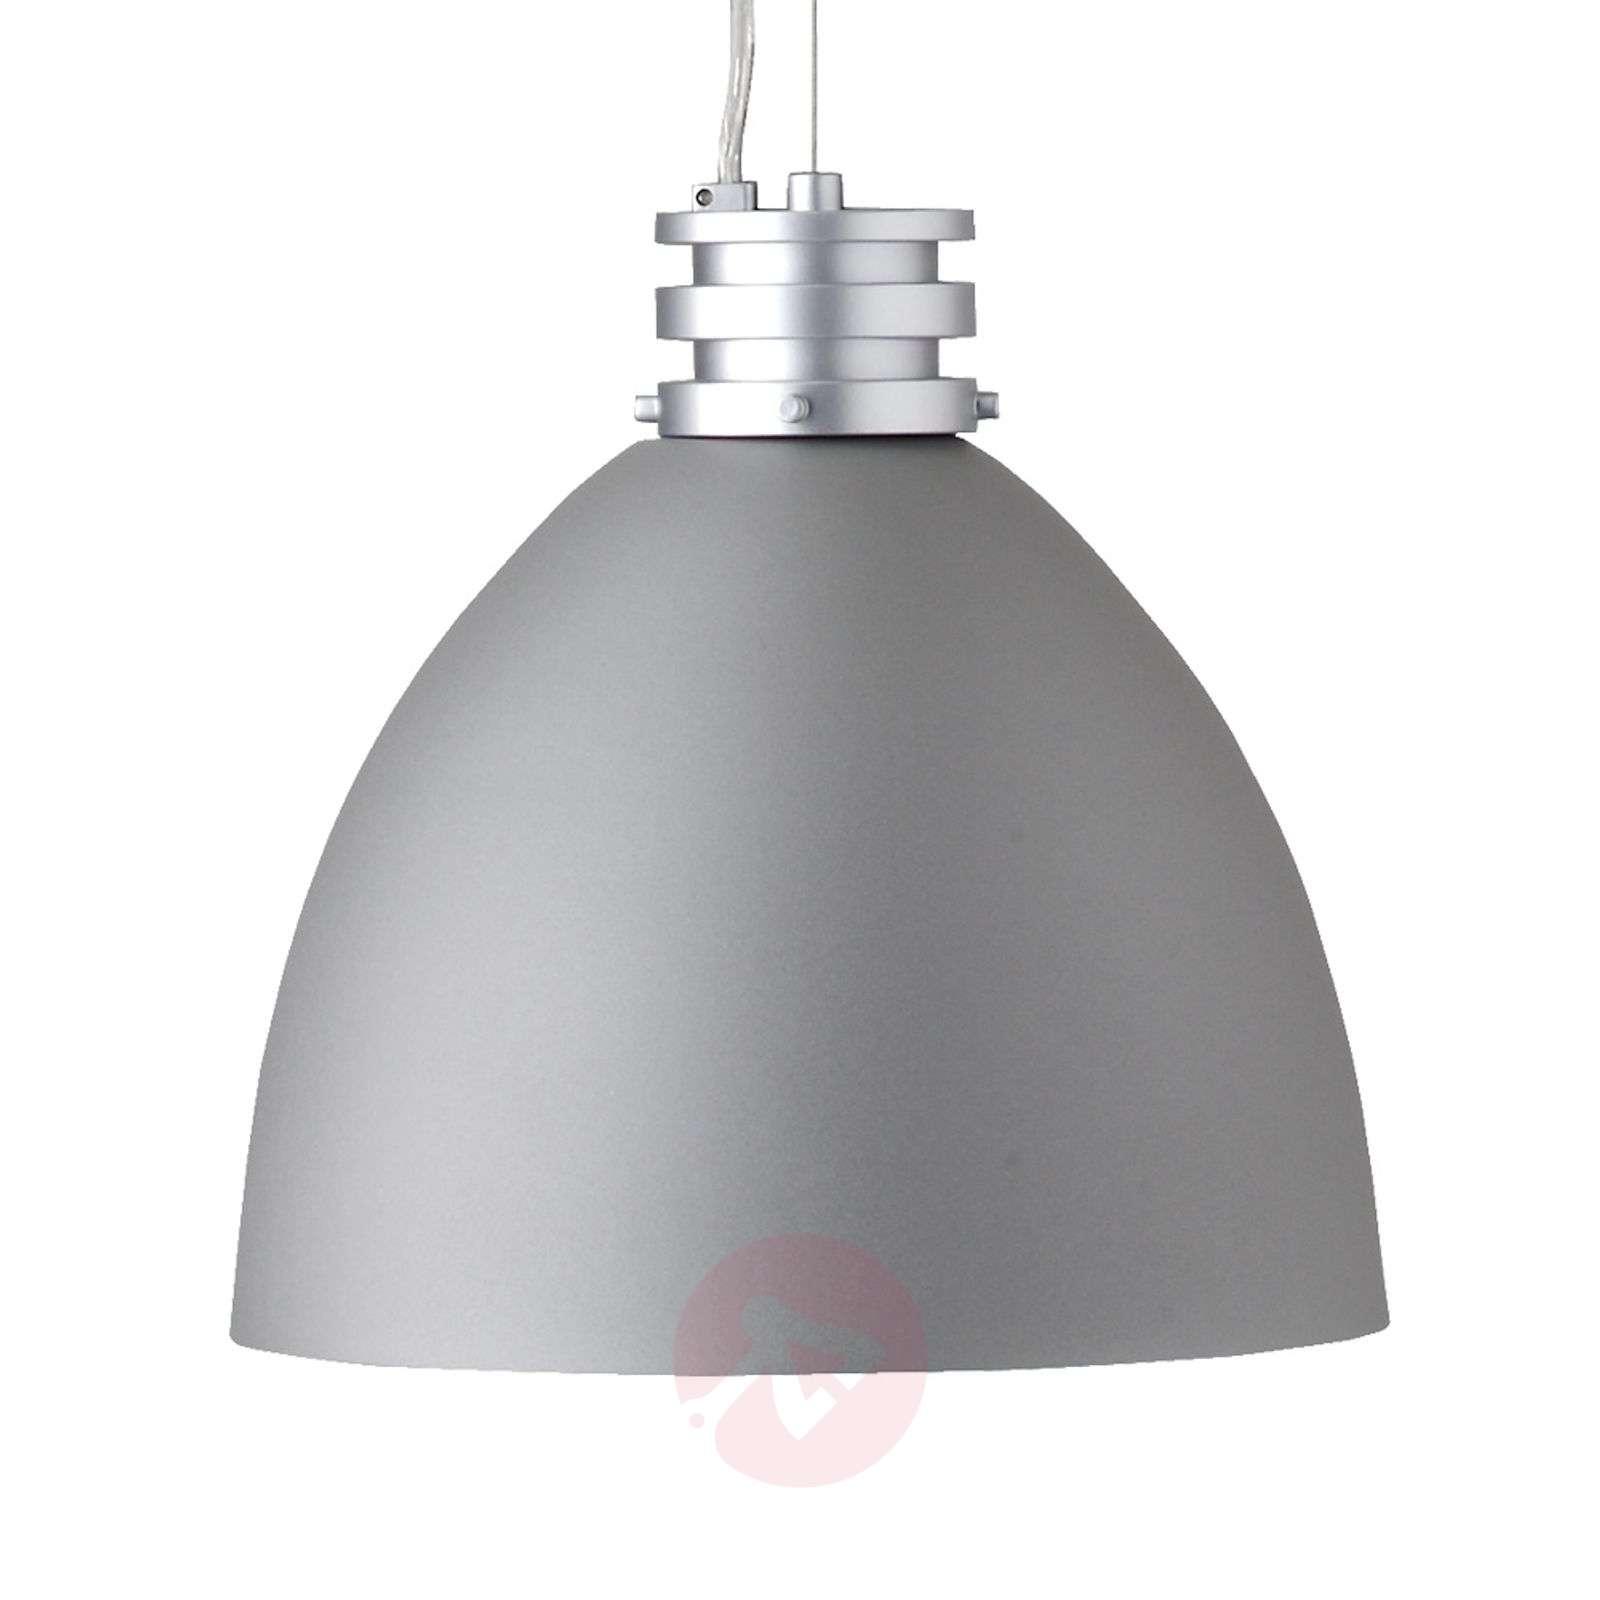 Tibo-riippuvalaisin-1508807X-01